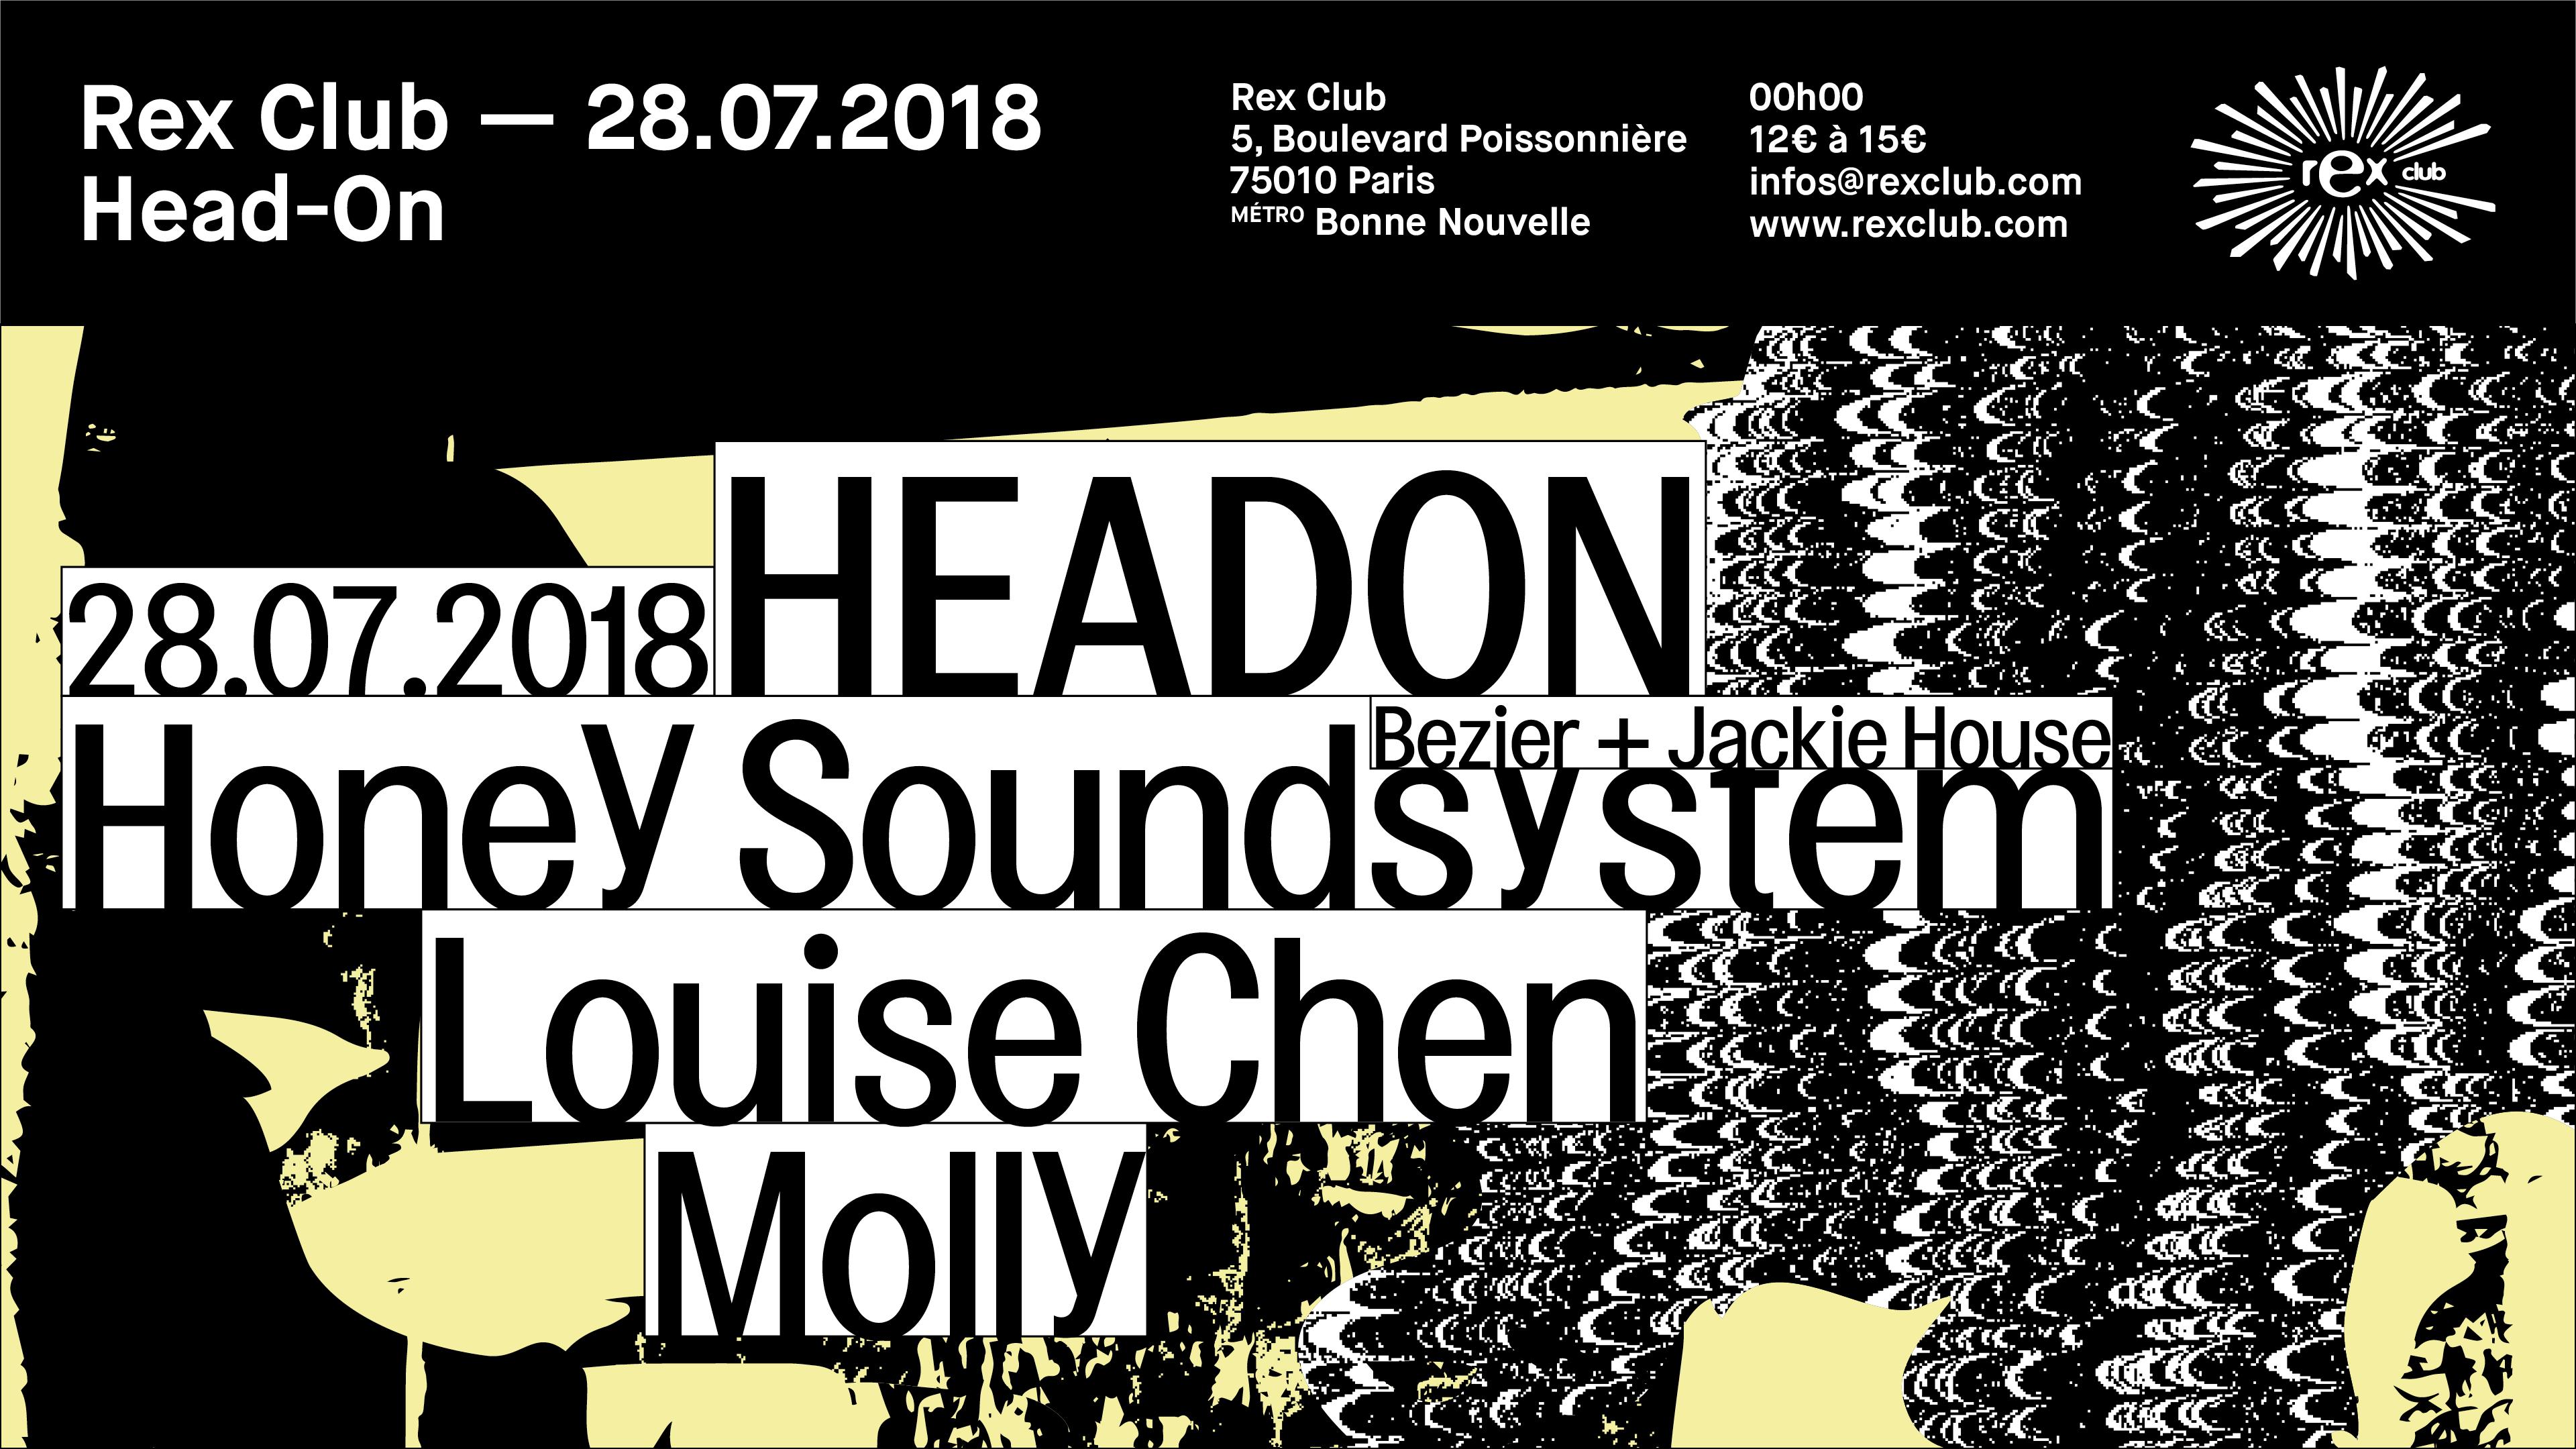 Headon: Honey Soundsystem, Louise Chen, Molly